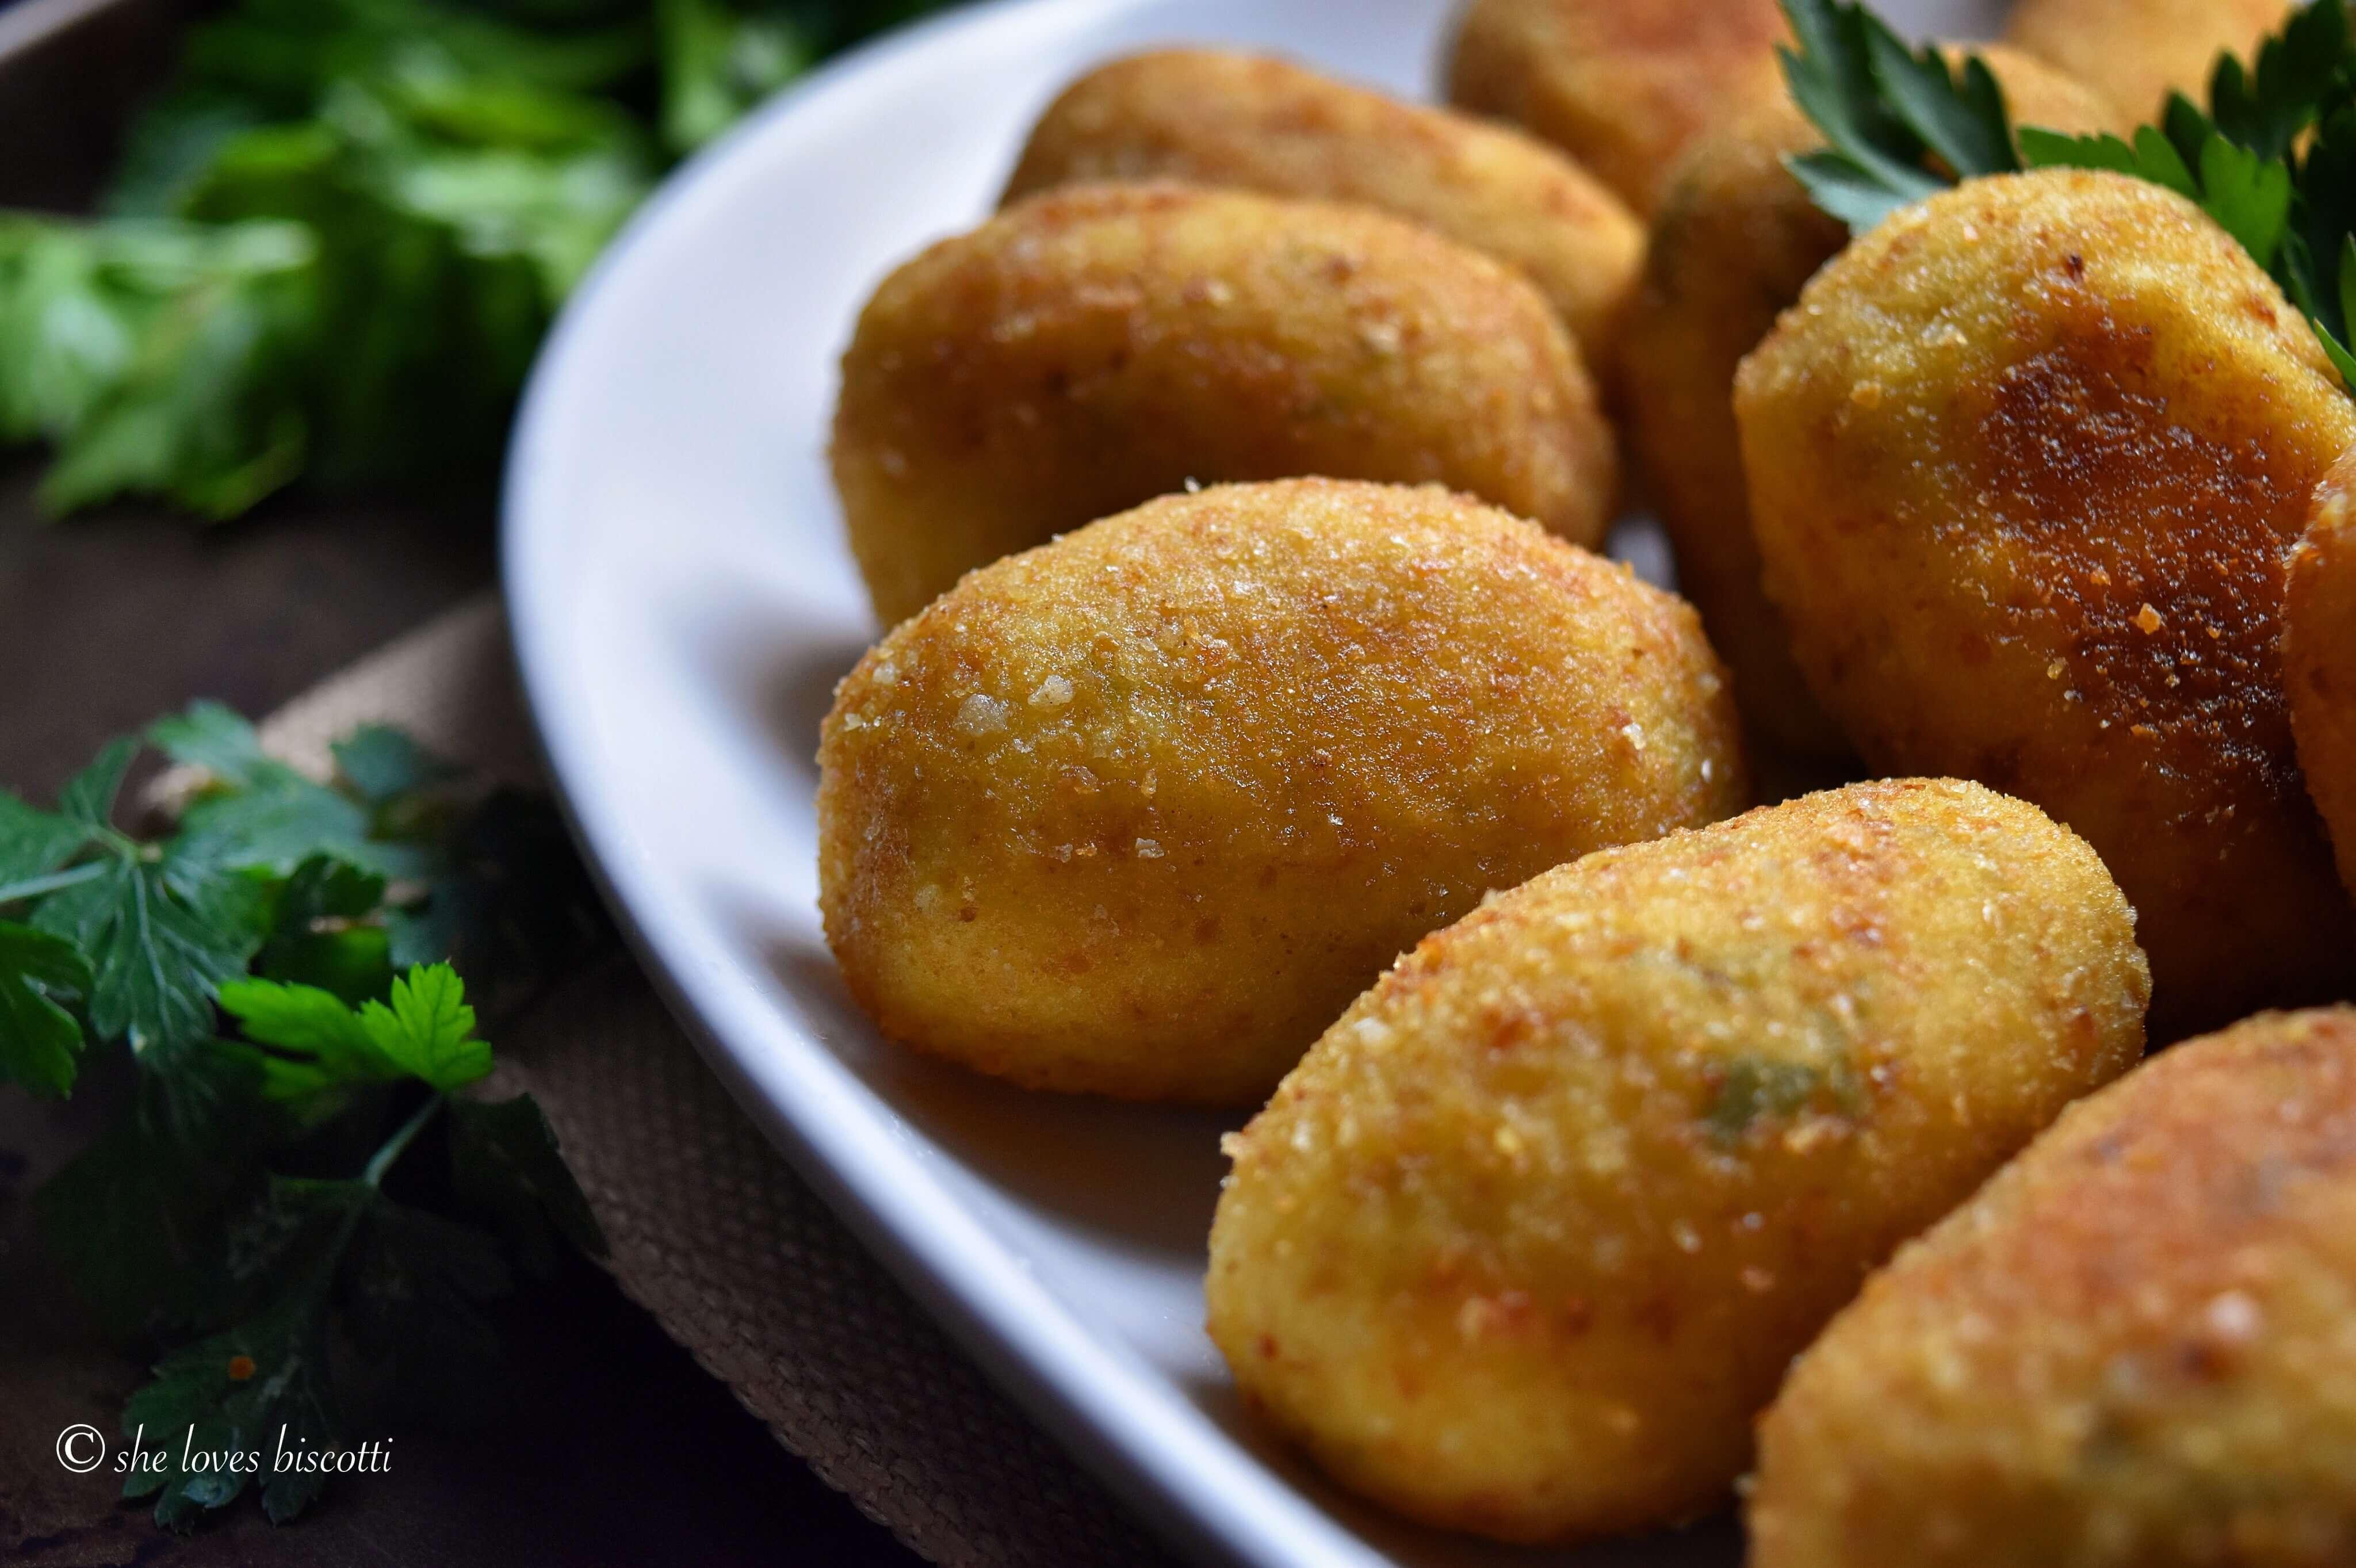 Best Homemade Italian Potato Croquettes - She loves biscotti